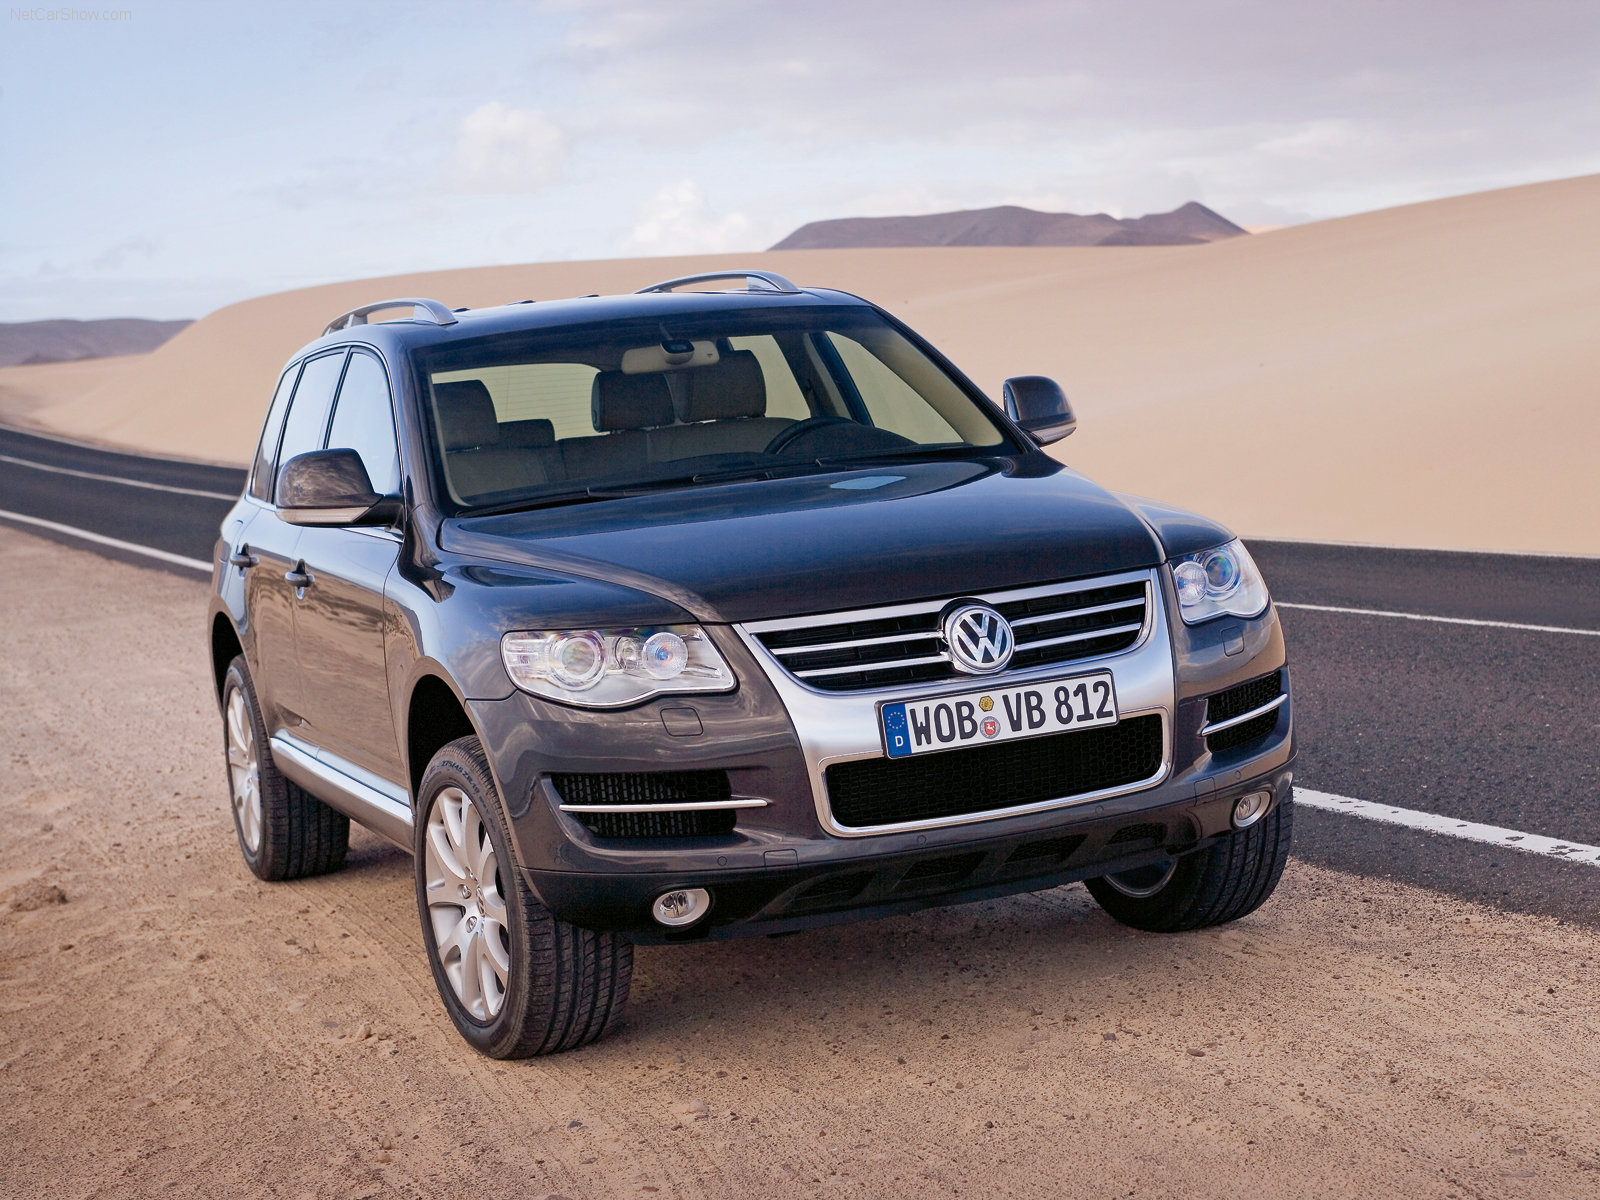 https://w04.ru/foto/Volkswagen-Touareg_2007_1600x1200_wallpaper_07.jpg